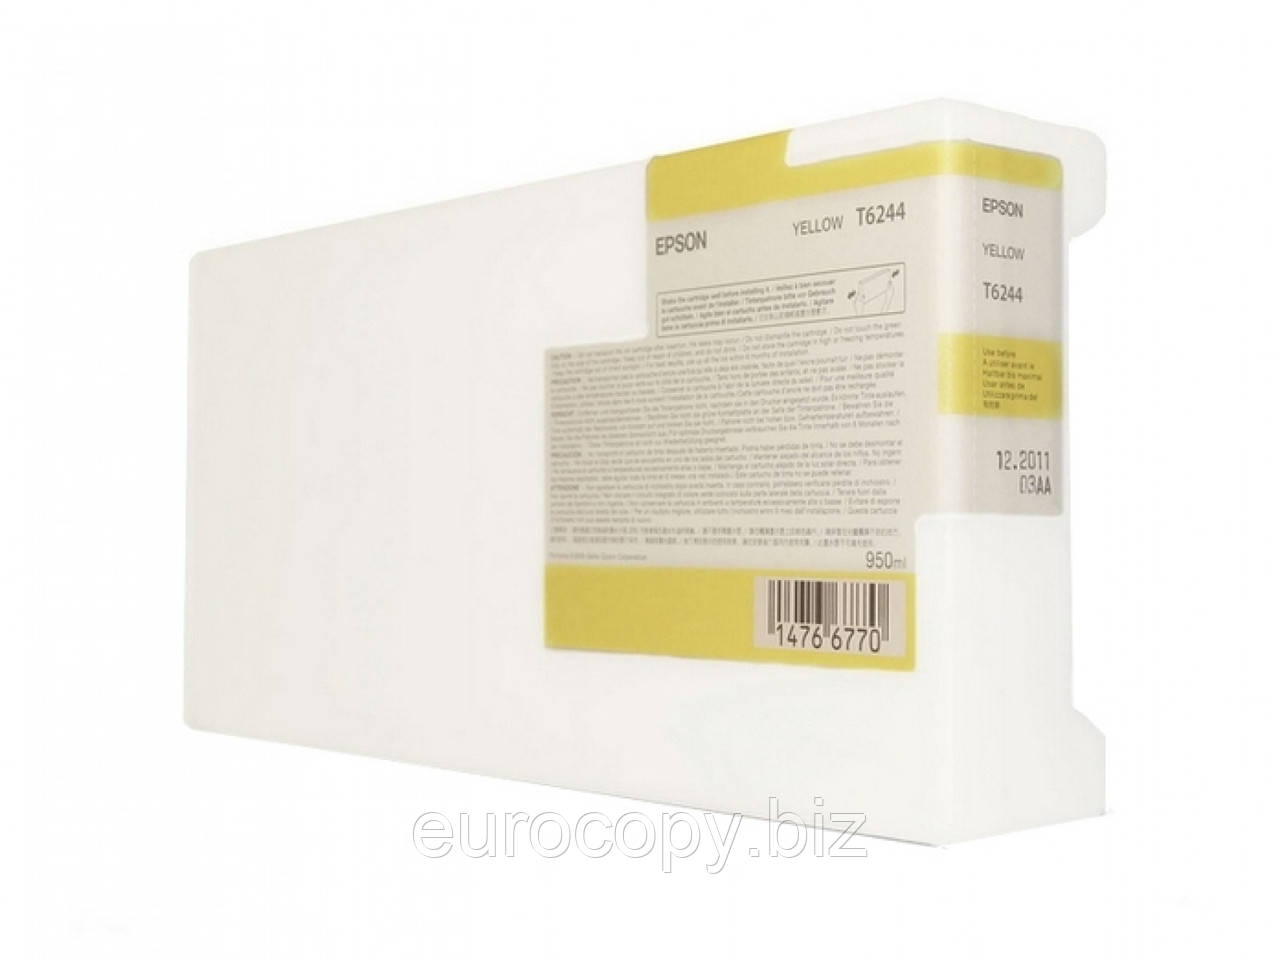 Картридж Epson SP-GS6000 Yellow (C13T624400) Original